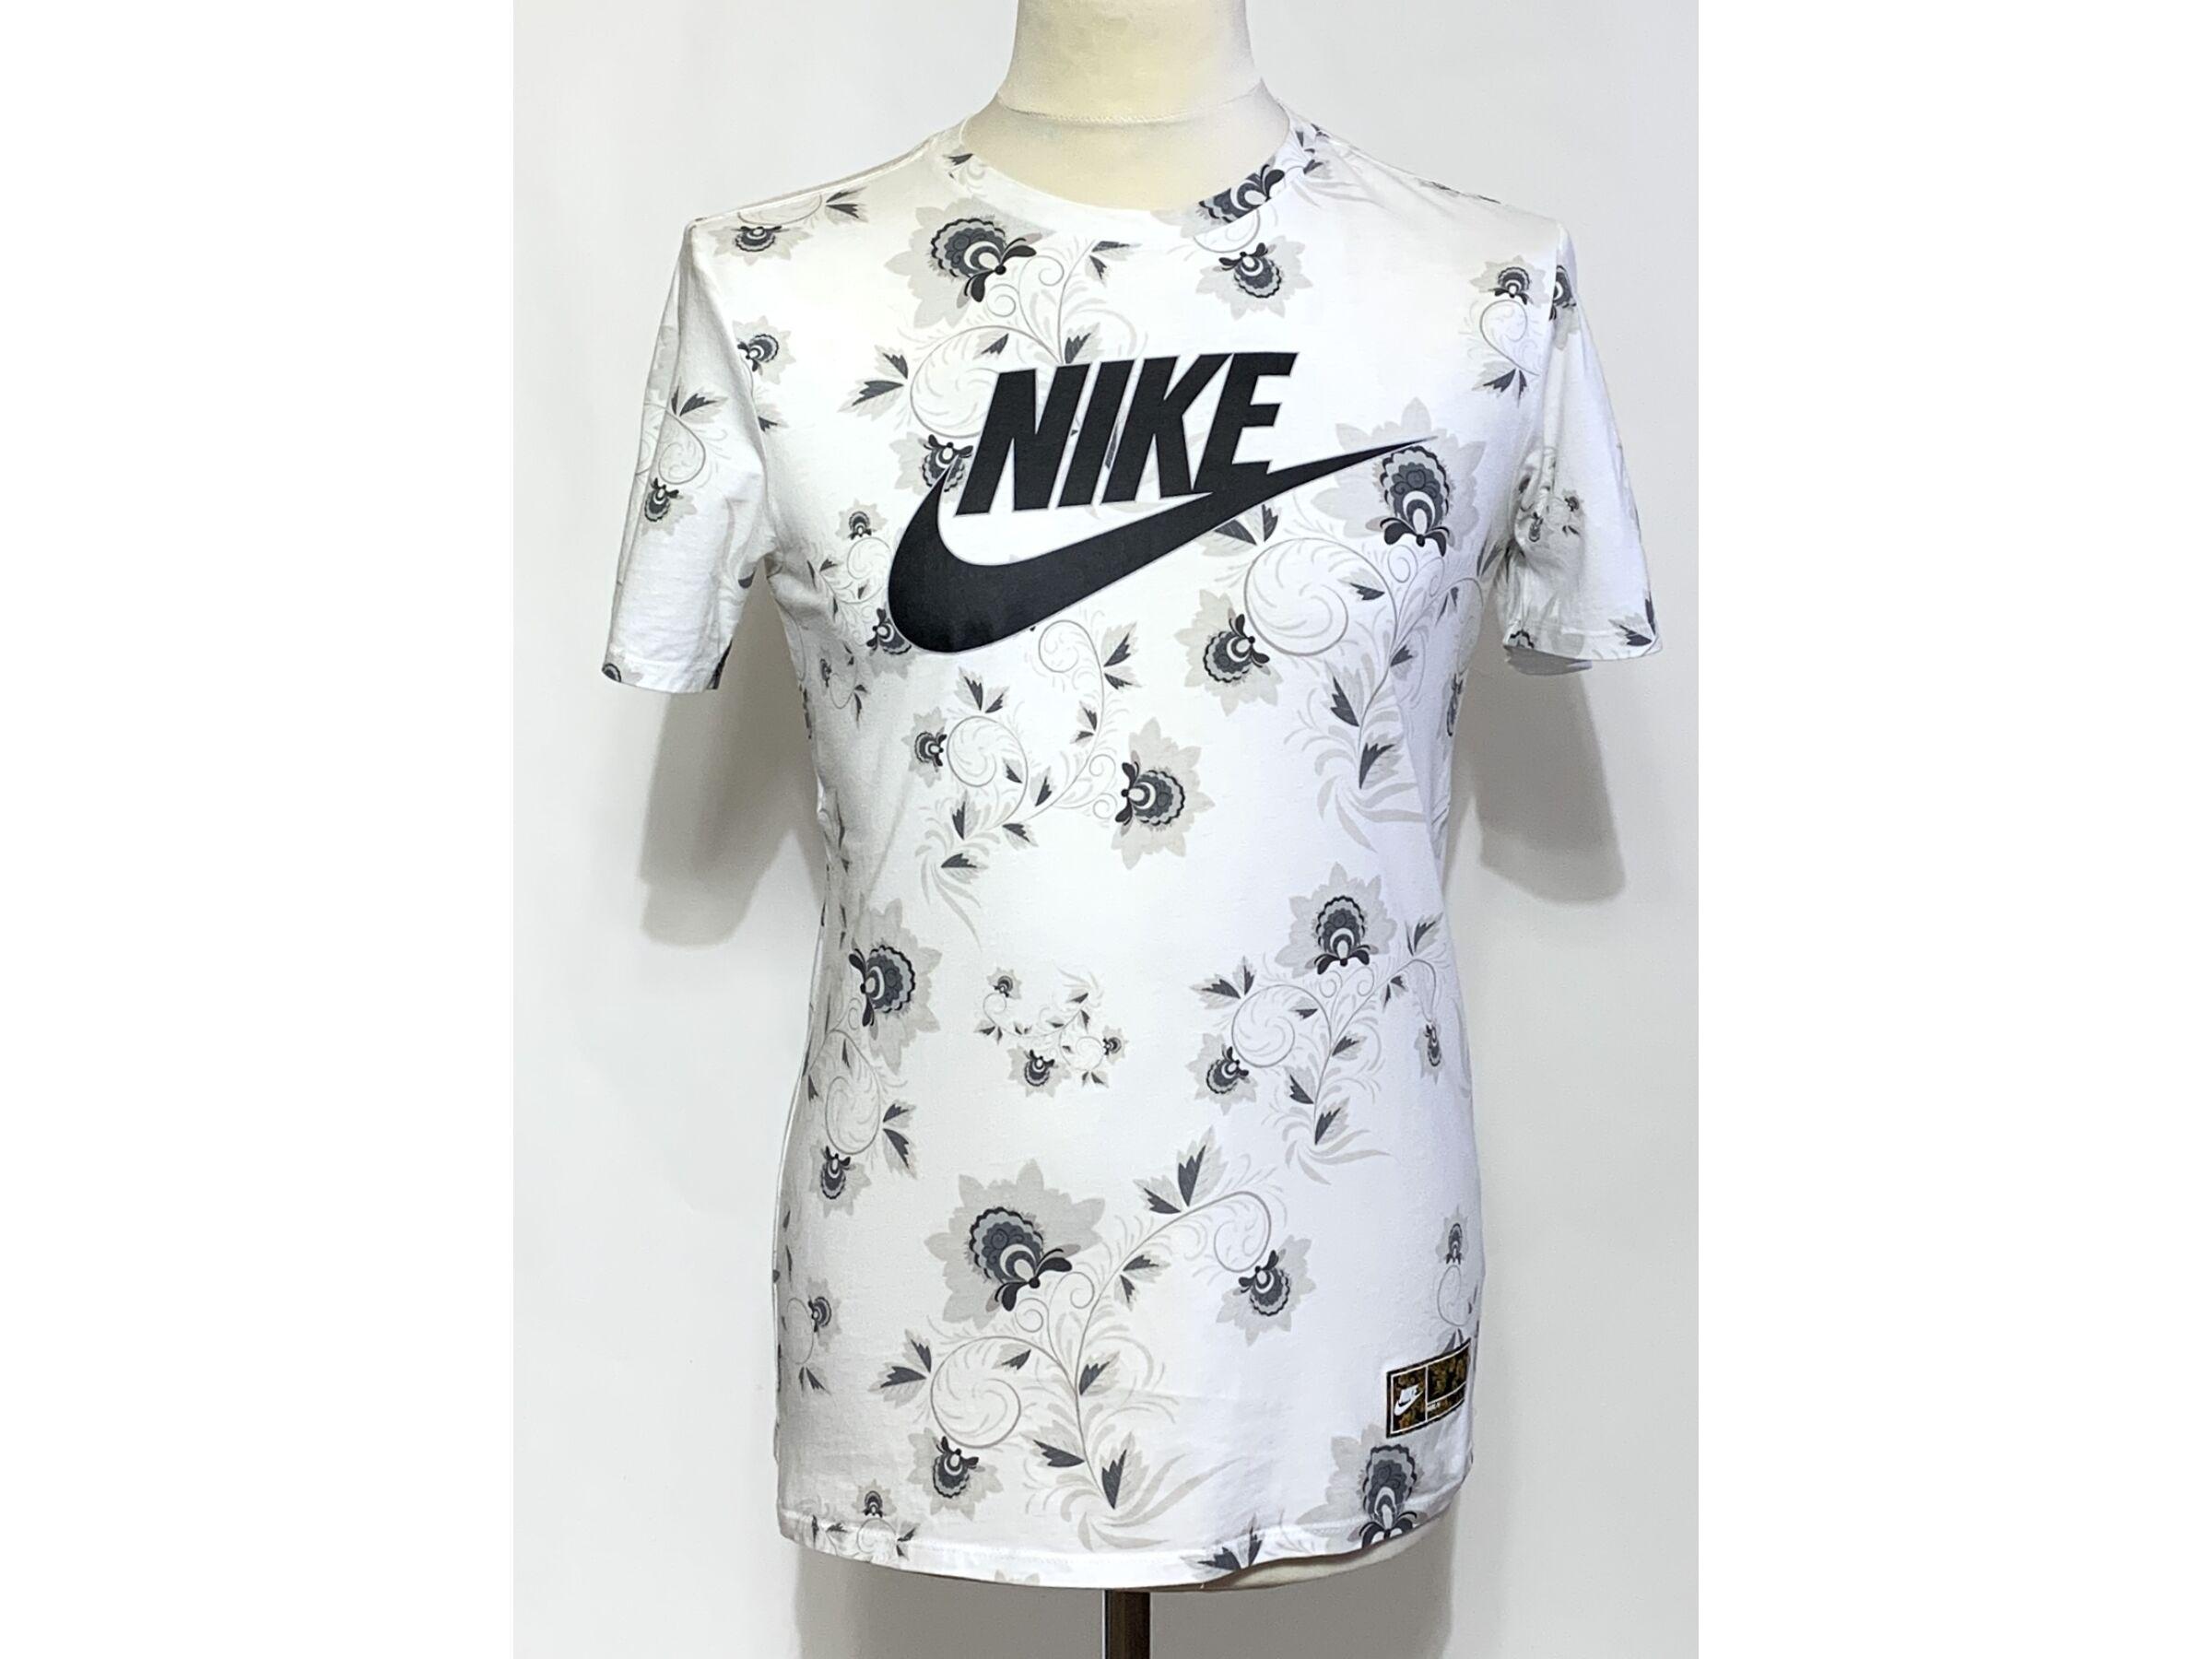 Nike póló (S)